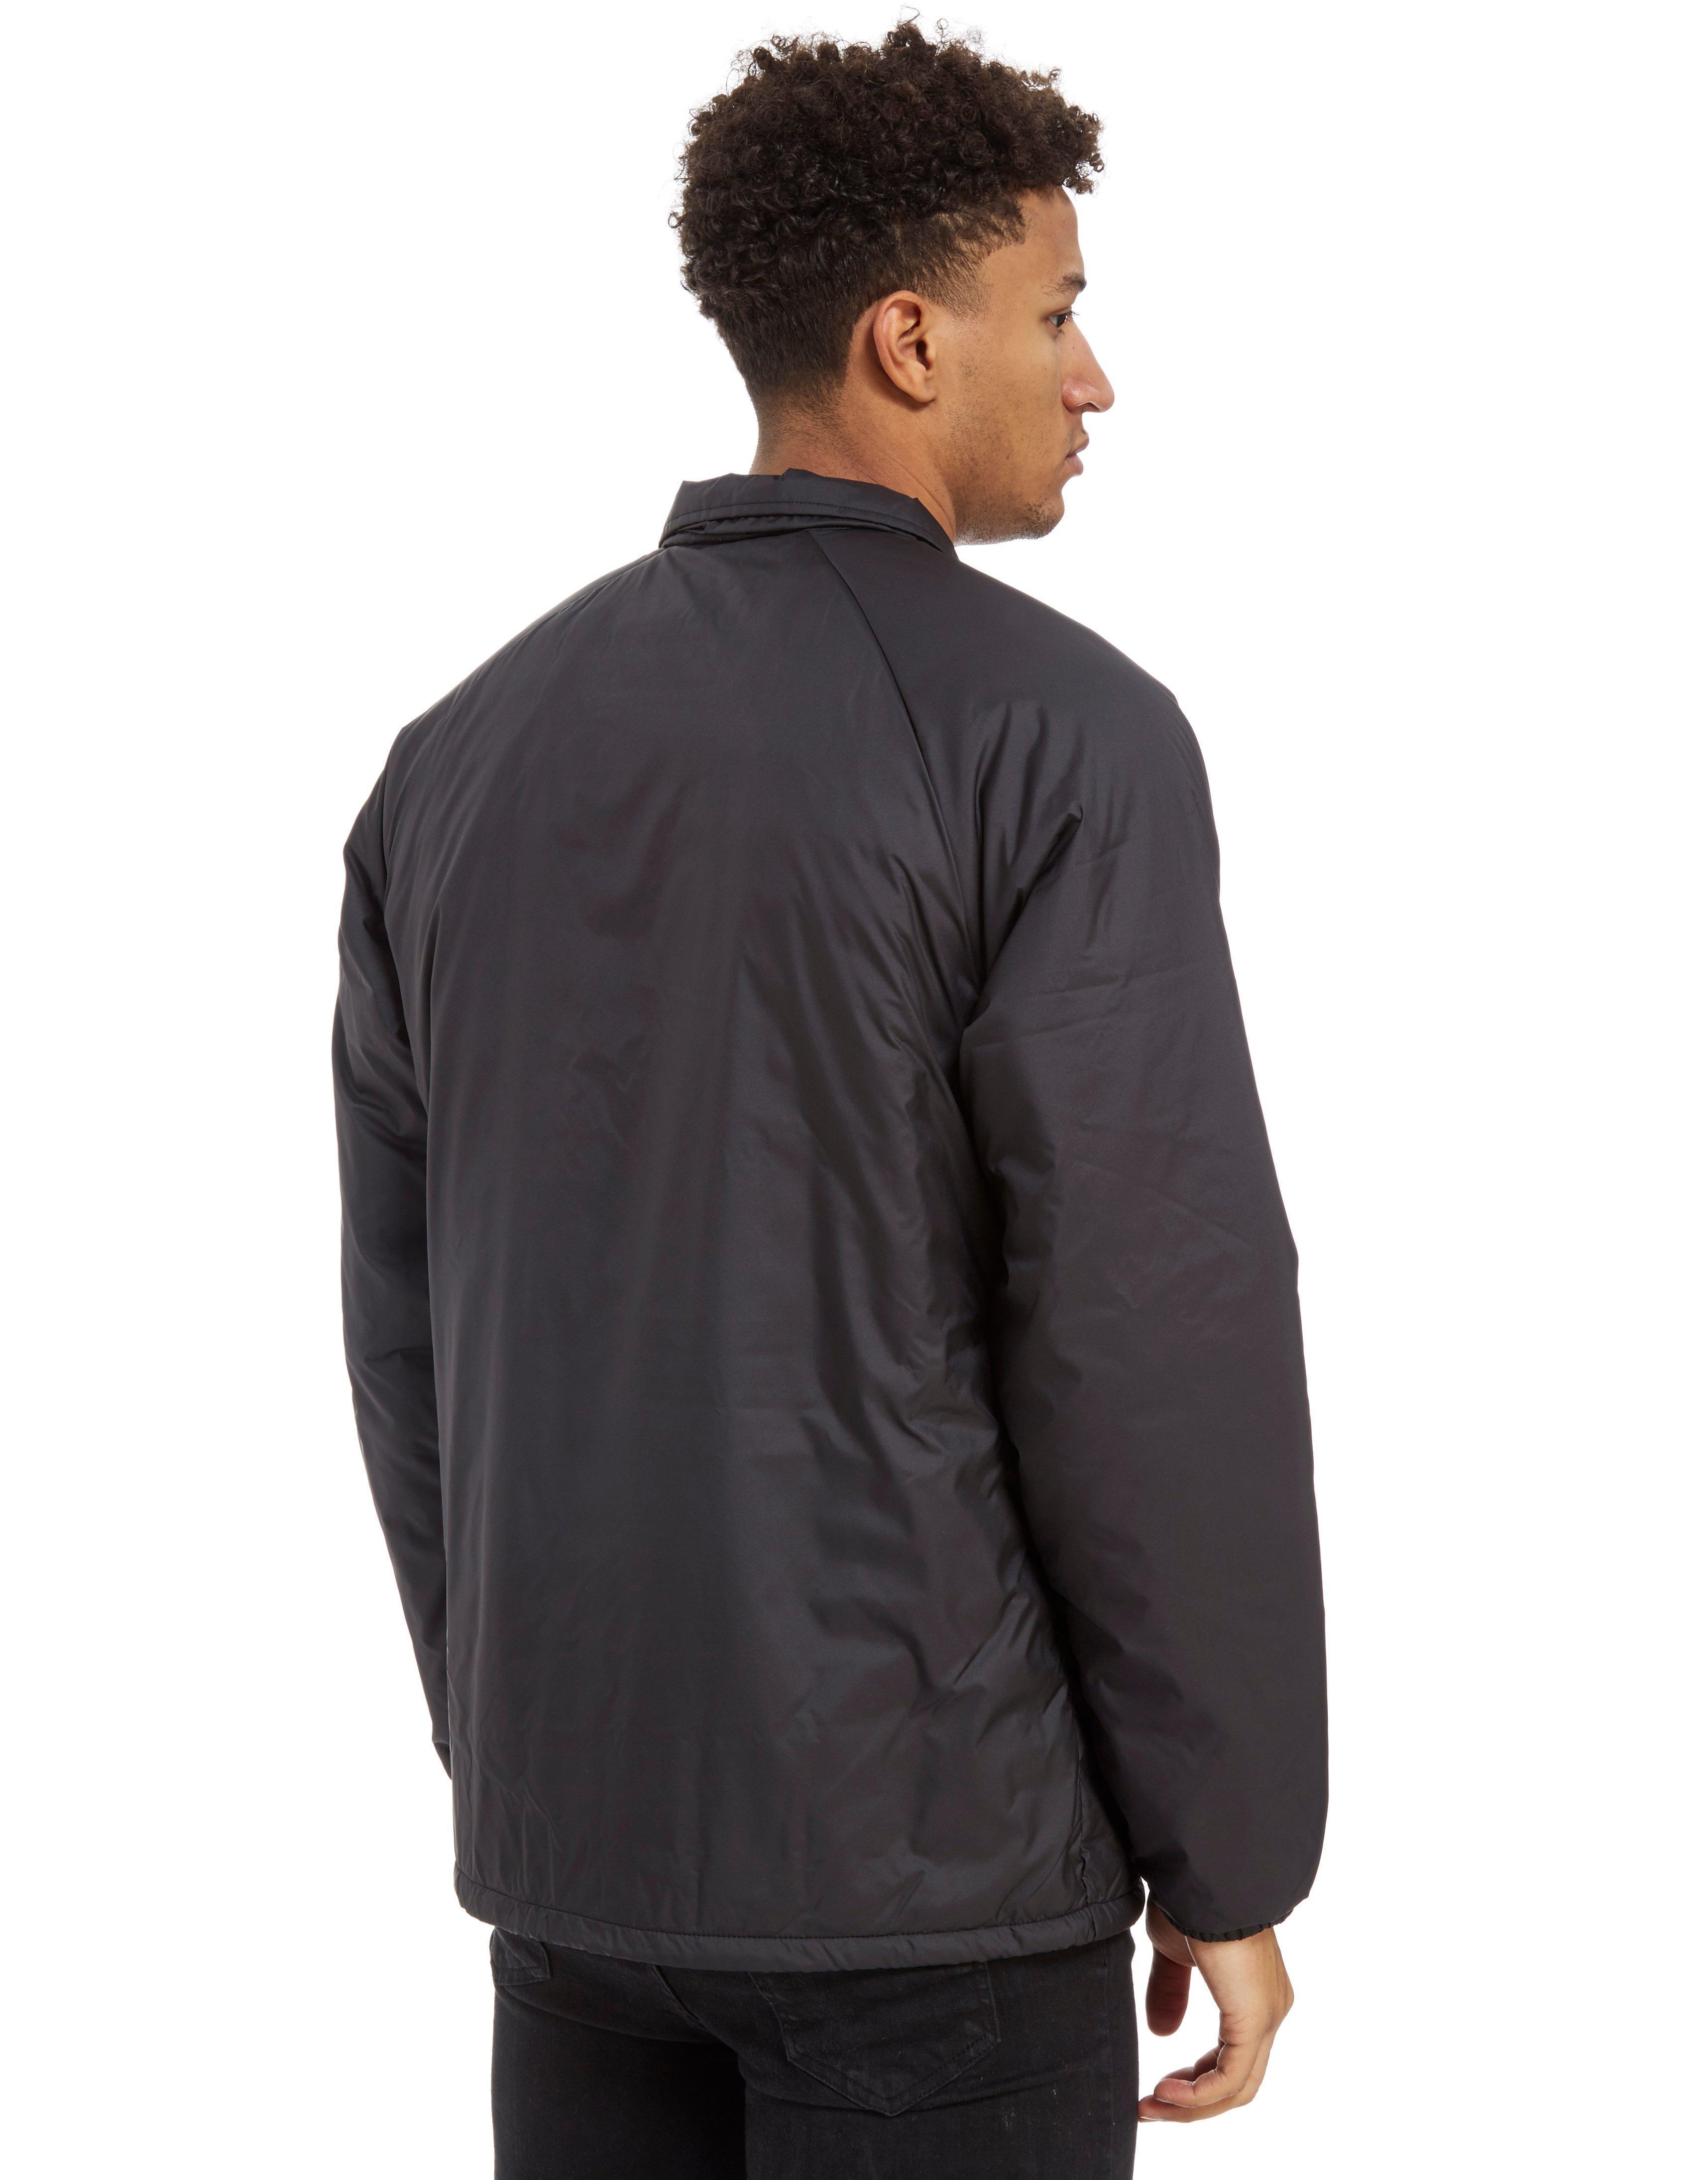 1db0c60330cc Lyst - Vans X The North Face Torrey Mte Jacket in Black for Men